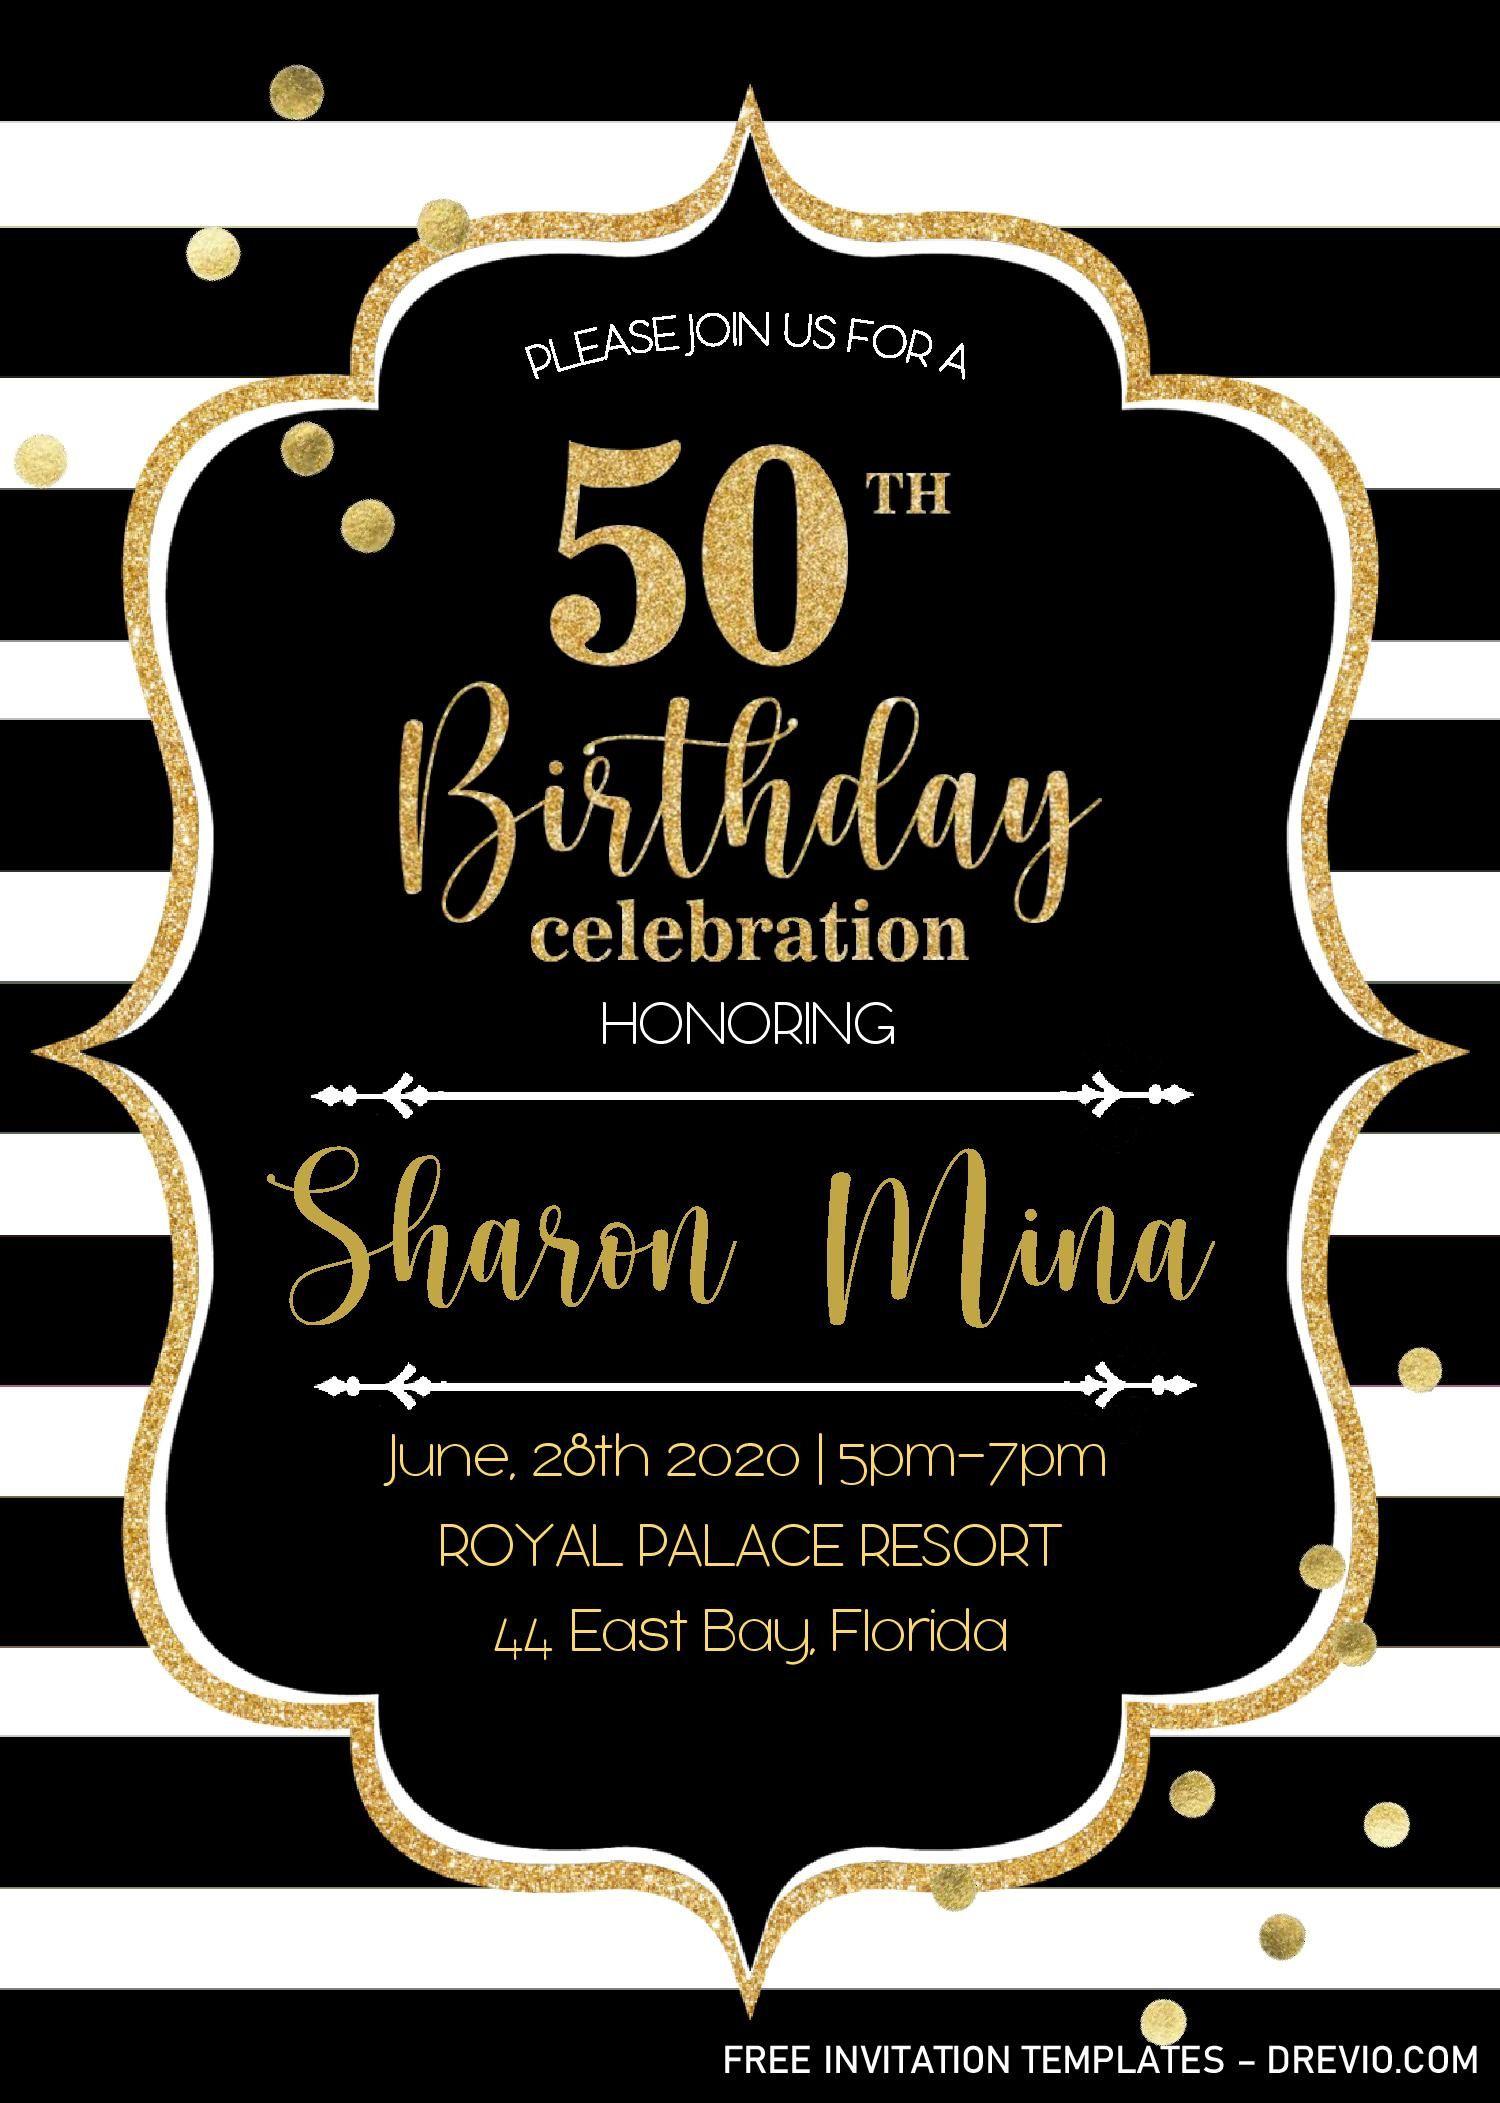 000 Striking 50th Wedding Anniversary Invitation Template Microsoft Word Image  FreeFull